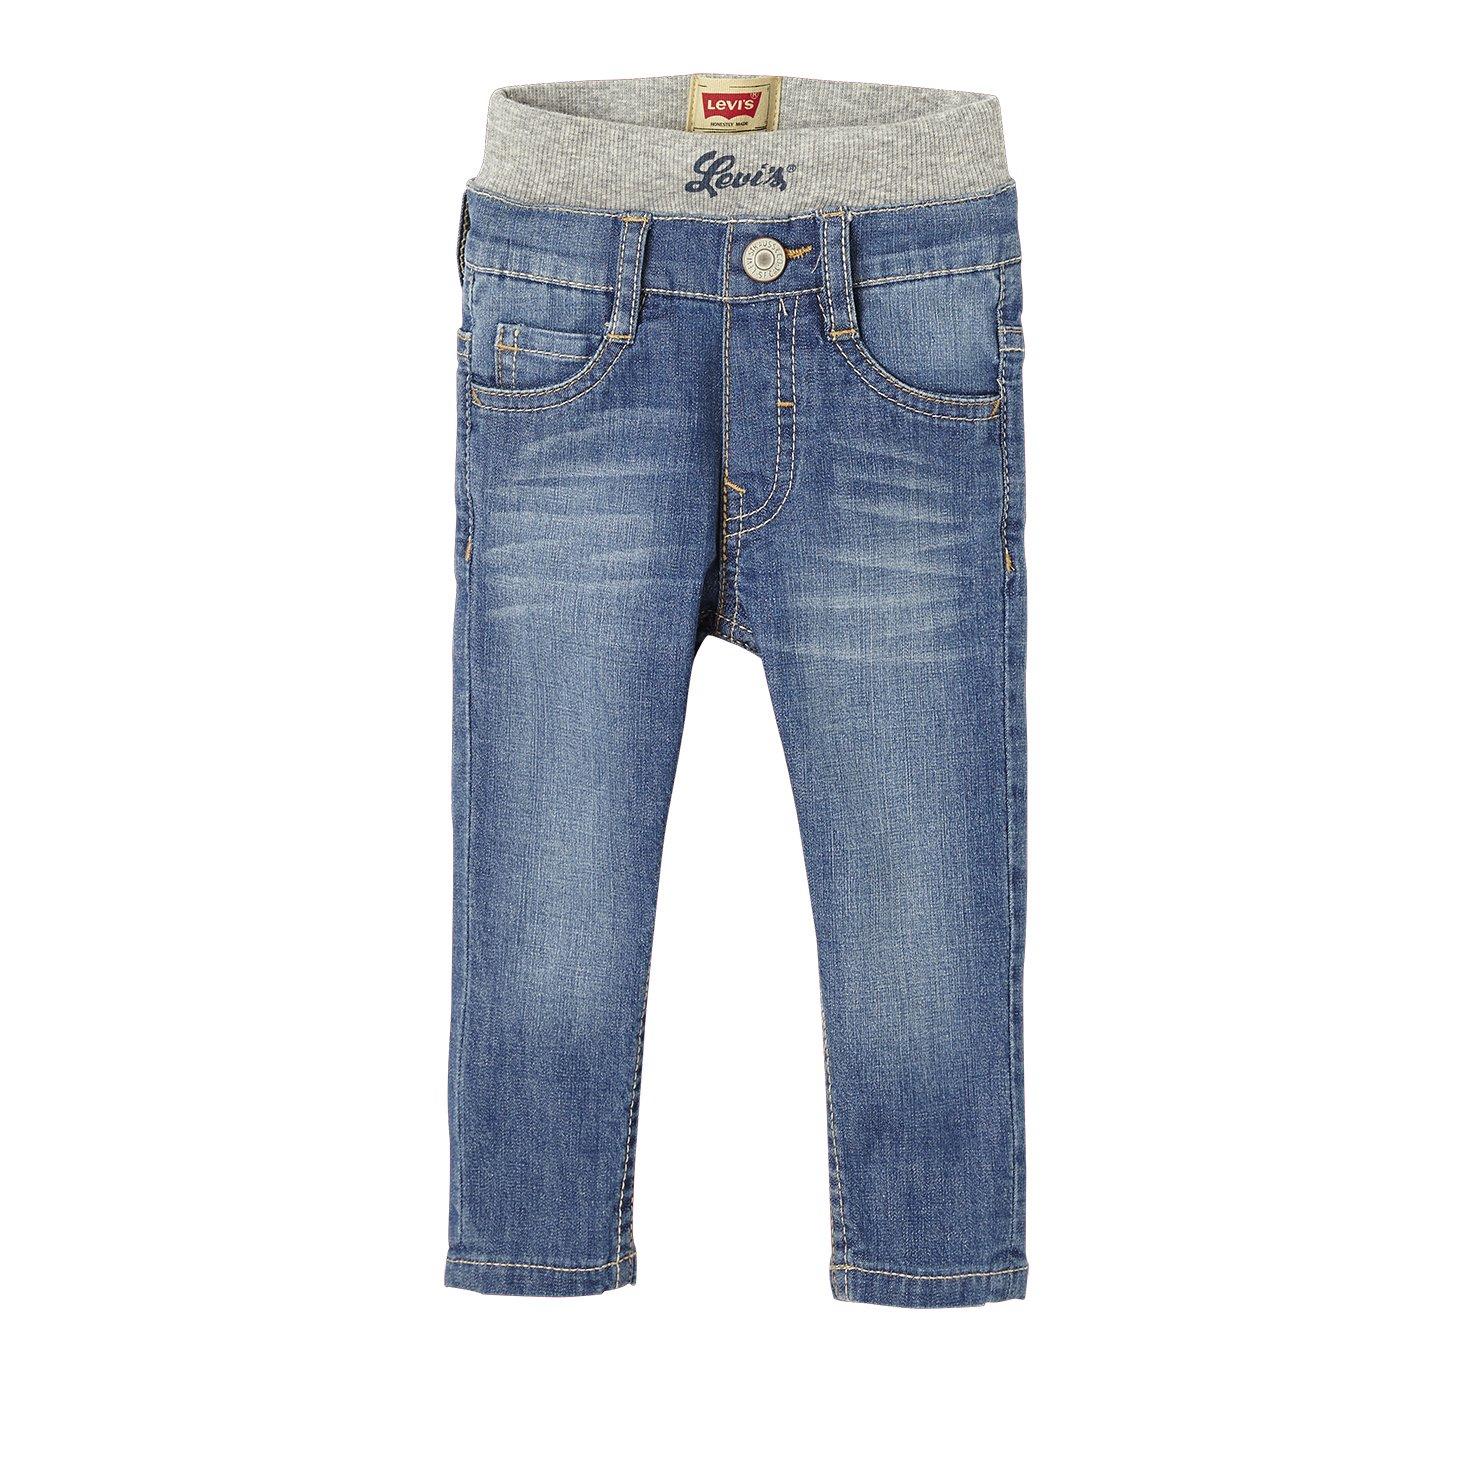 Levi's Kids Baby-Jungen Jeans Levi' s Kids NL22064